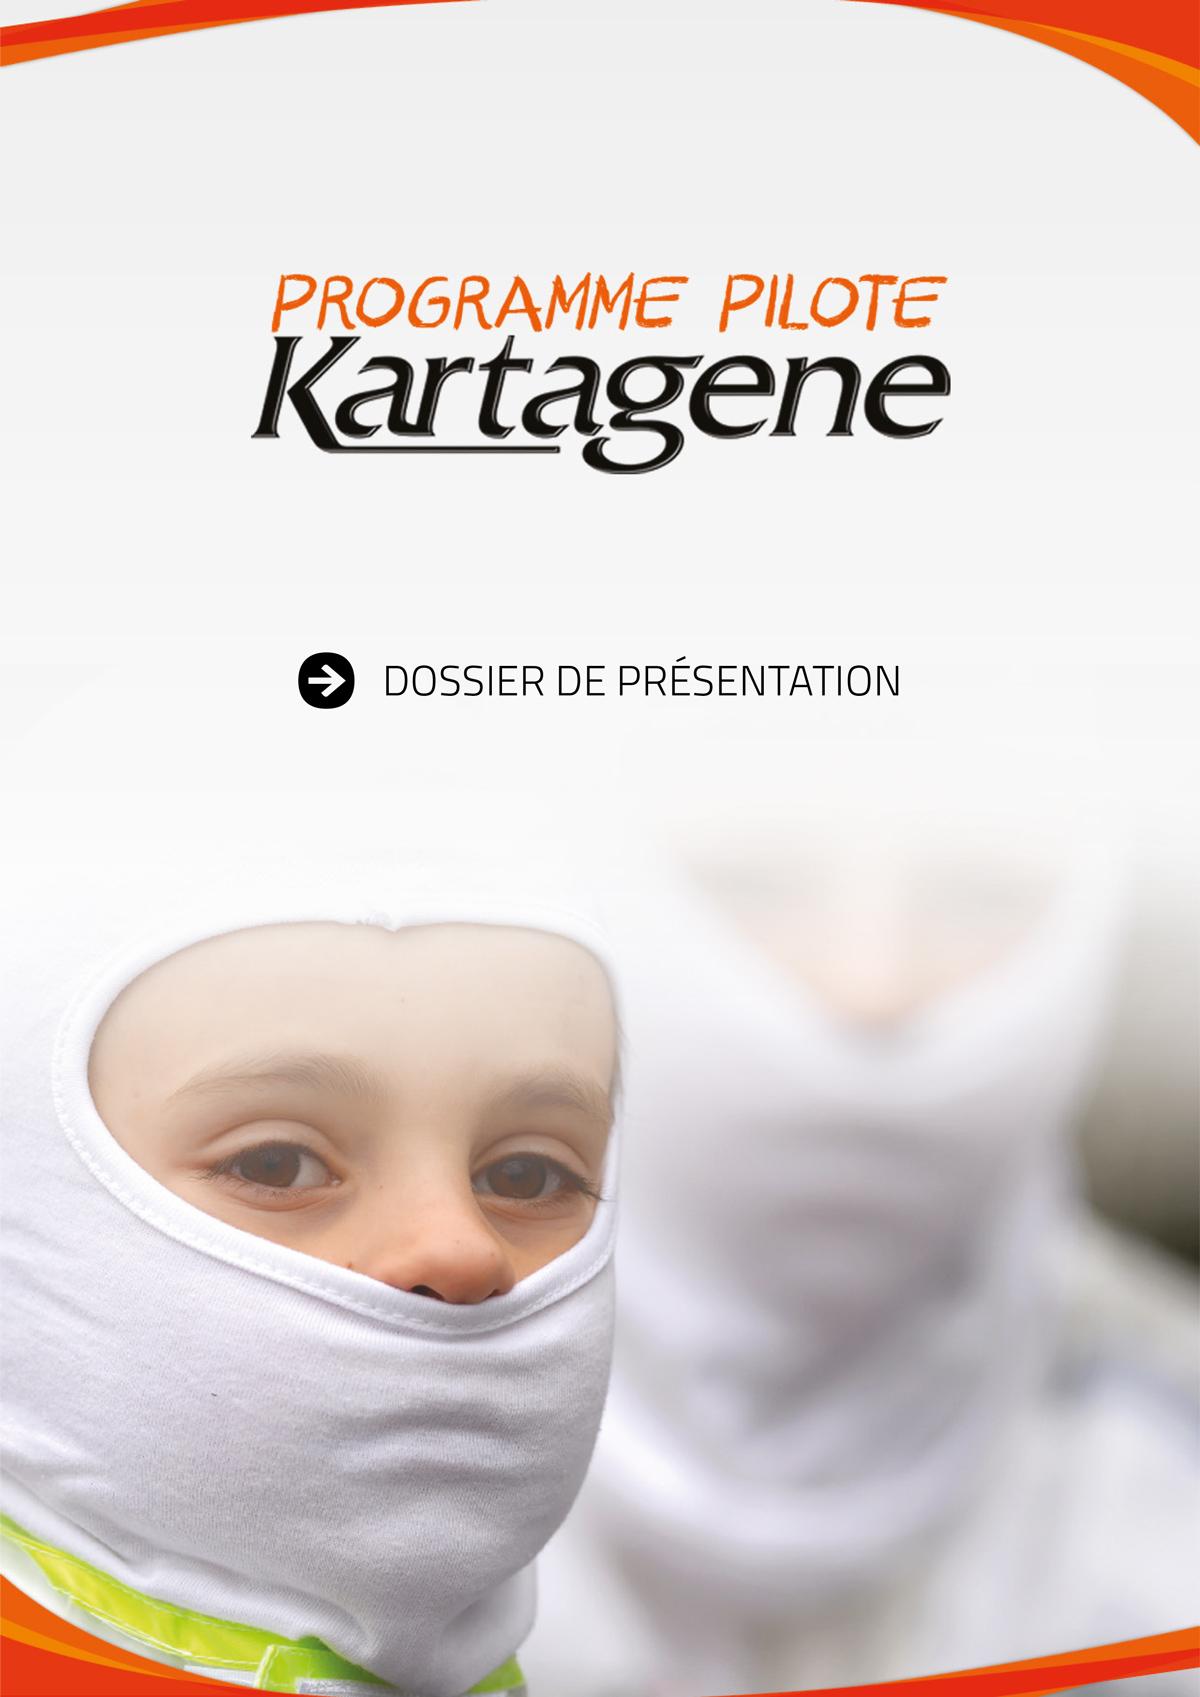 Kartagene_Dossier_Presentation